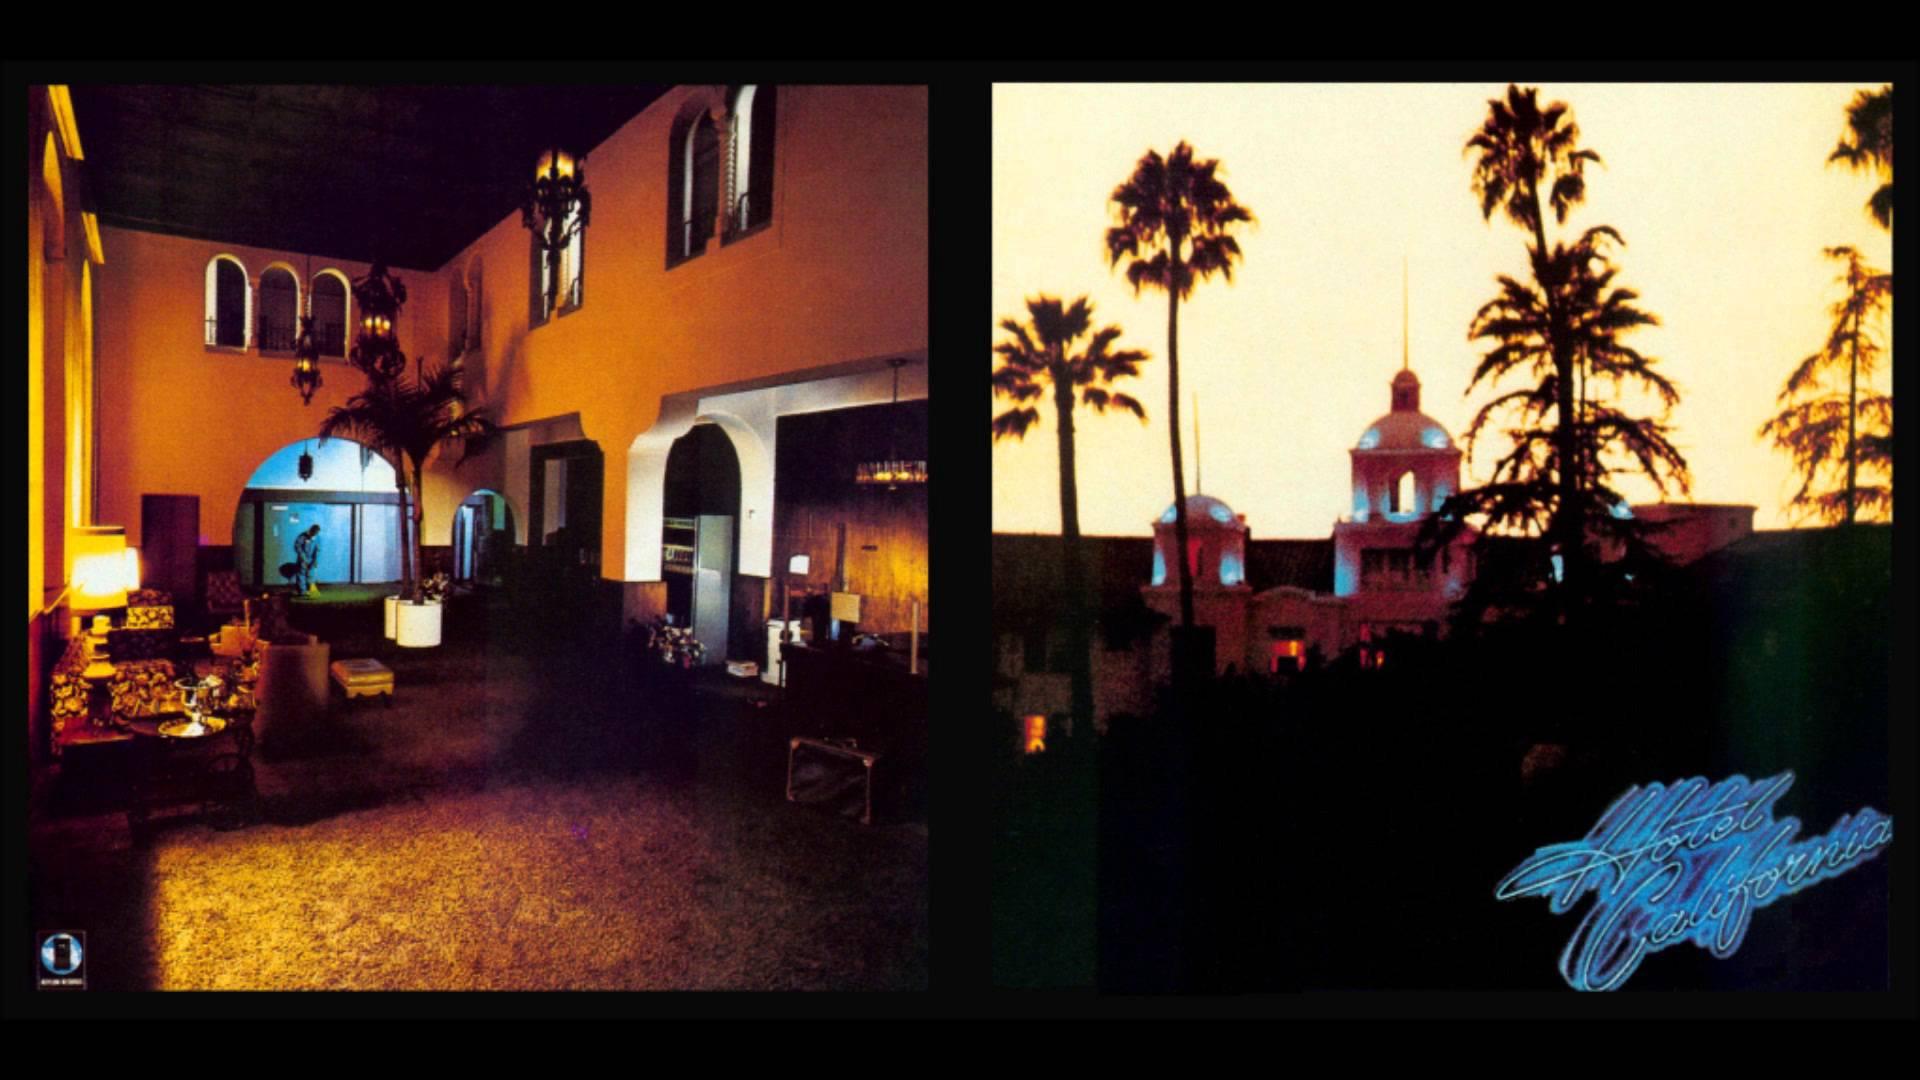 Hotel California un ever green di eccessi, paure e speranza